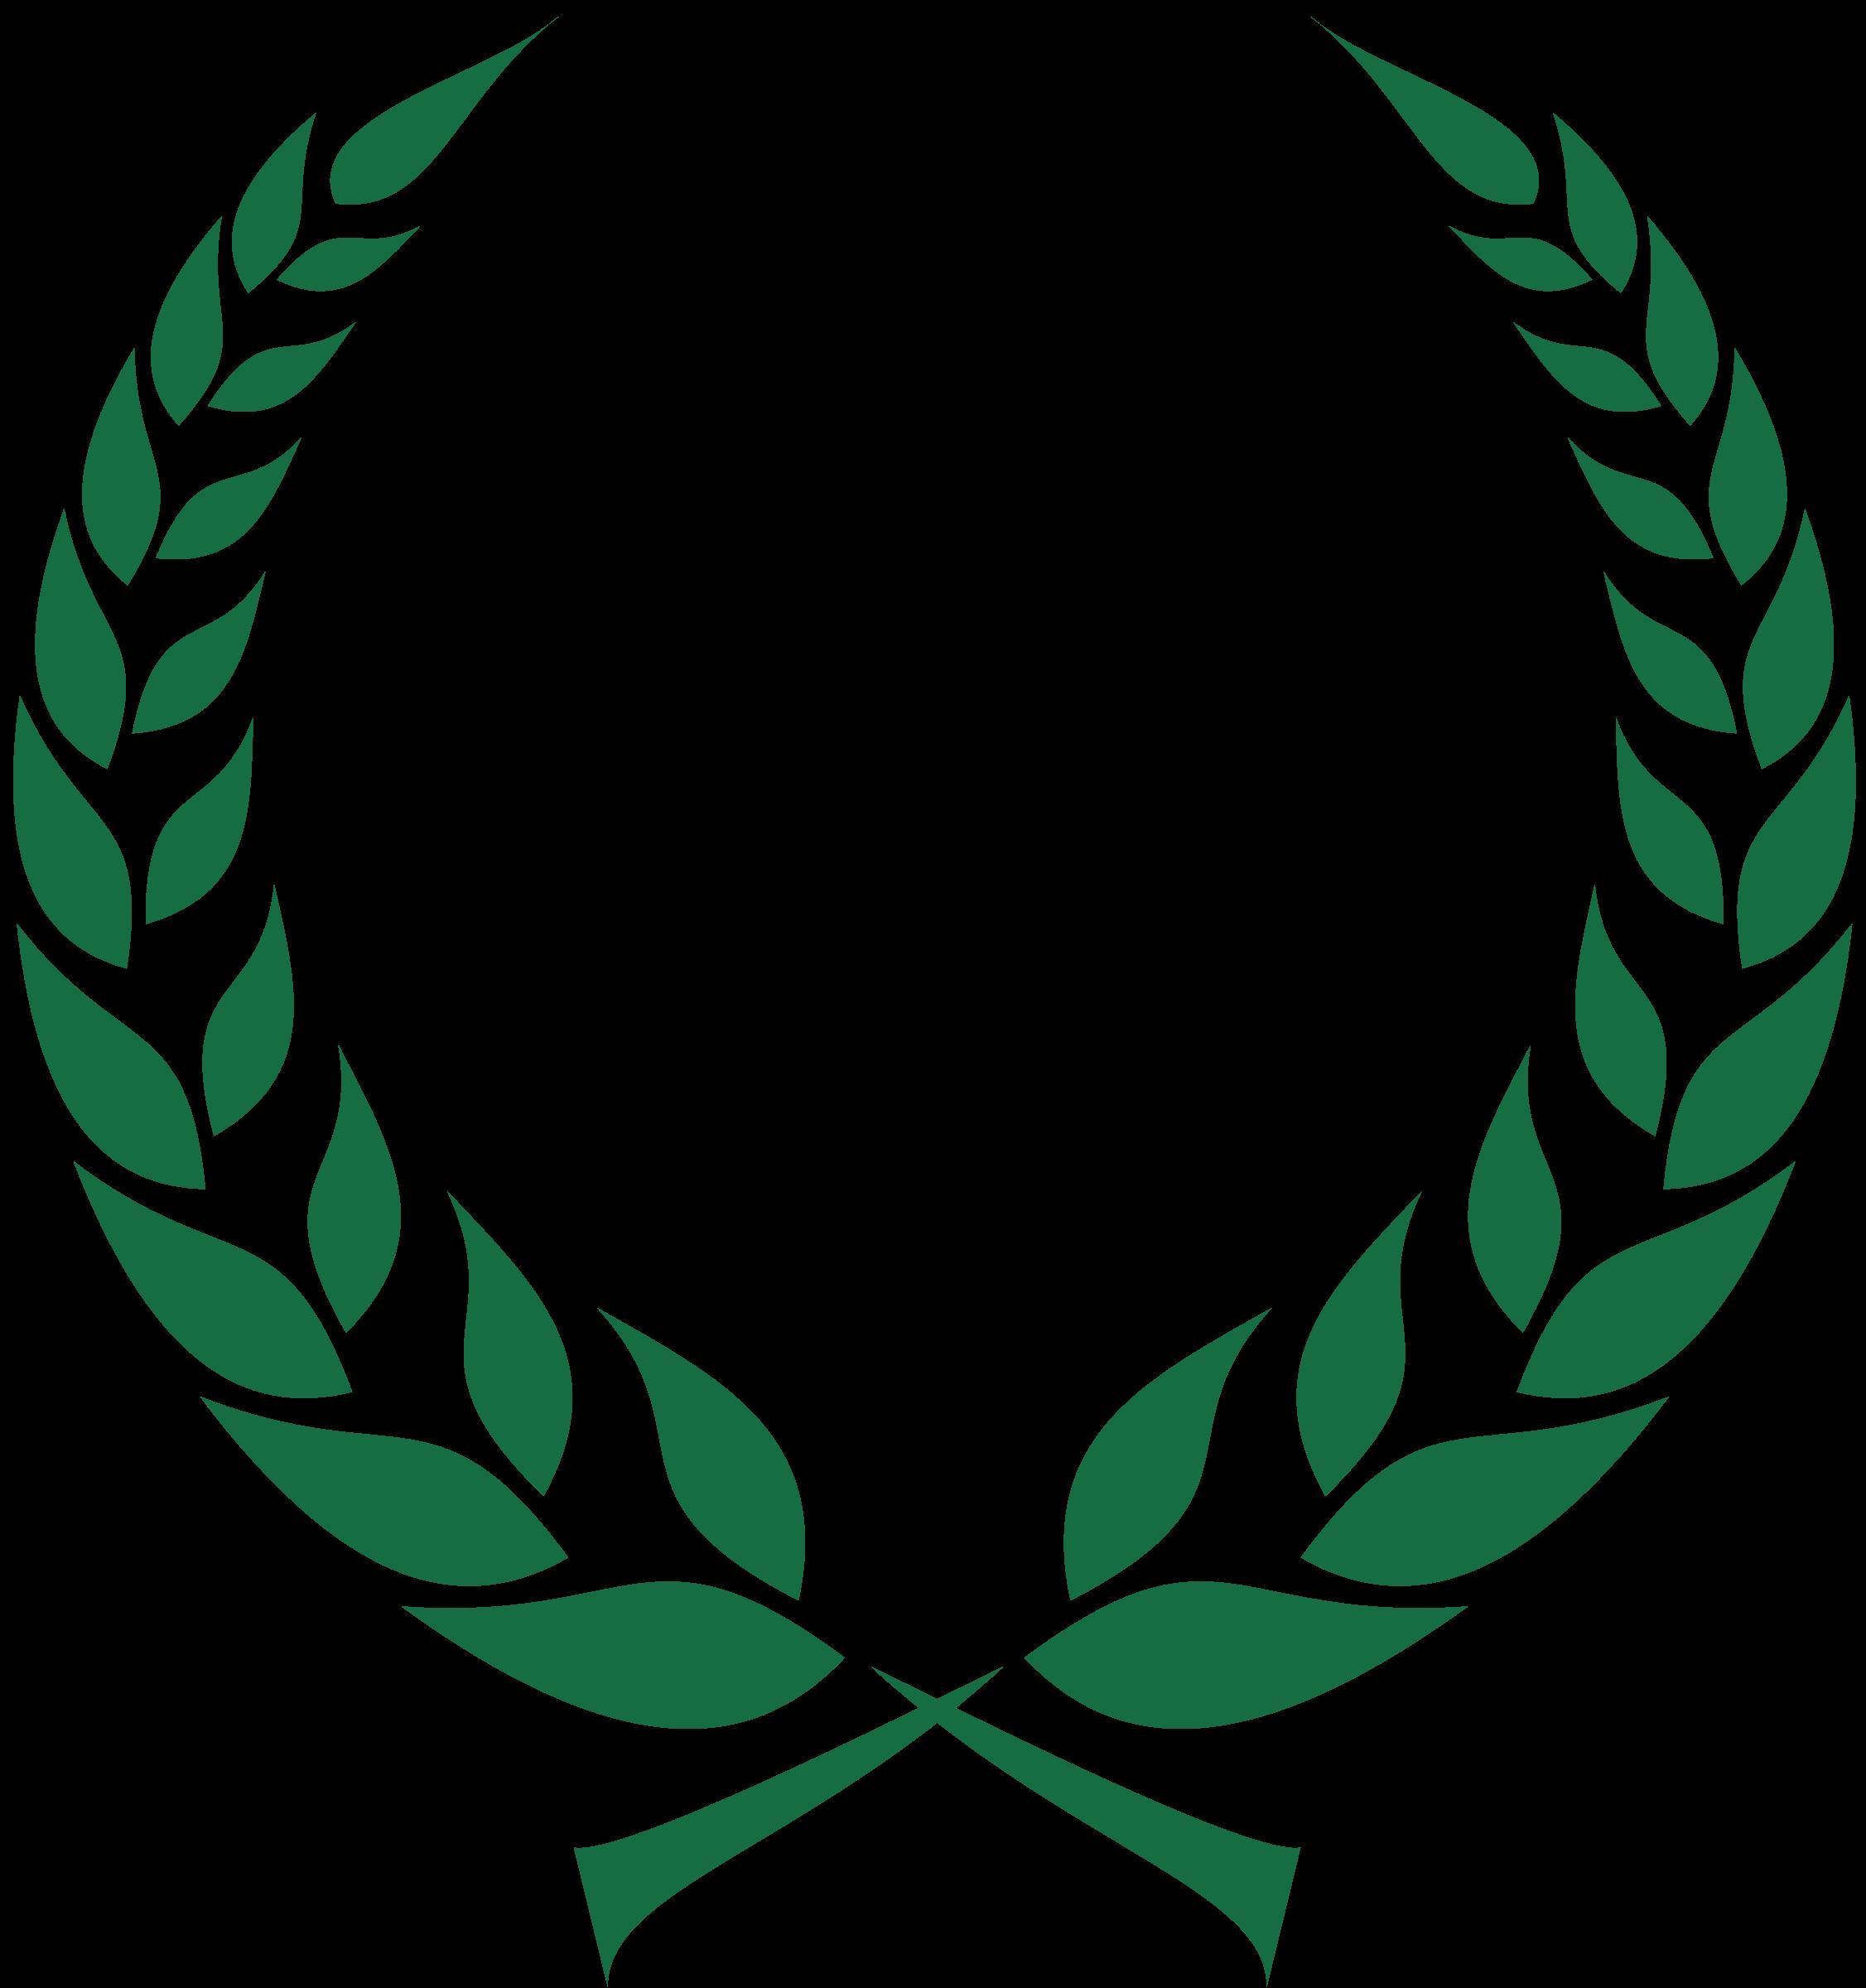 Laurel clipart olympic. Olive wreath big image